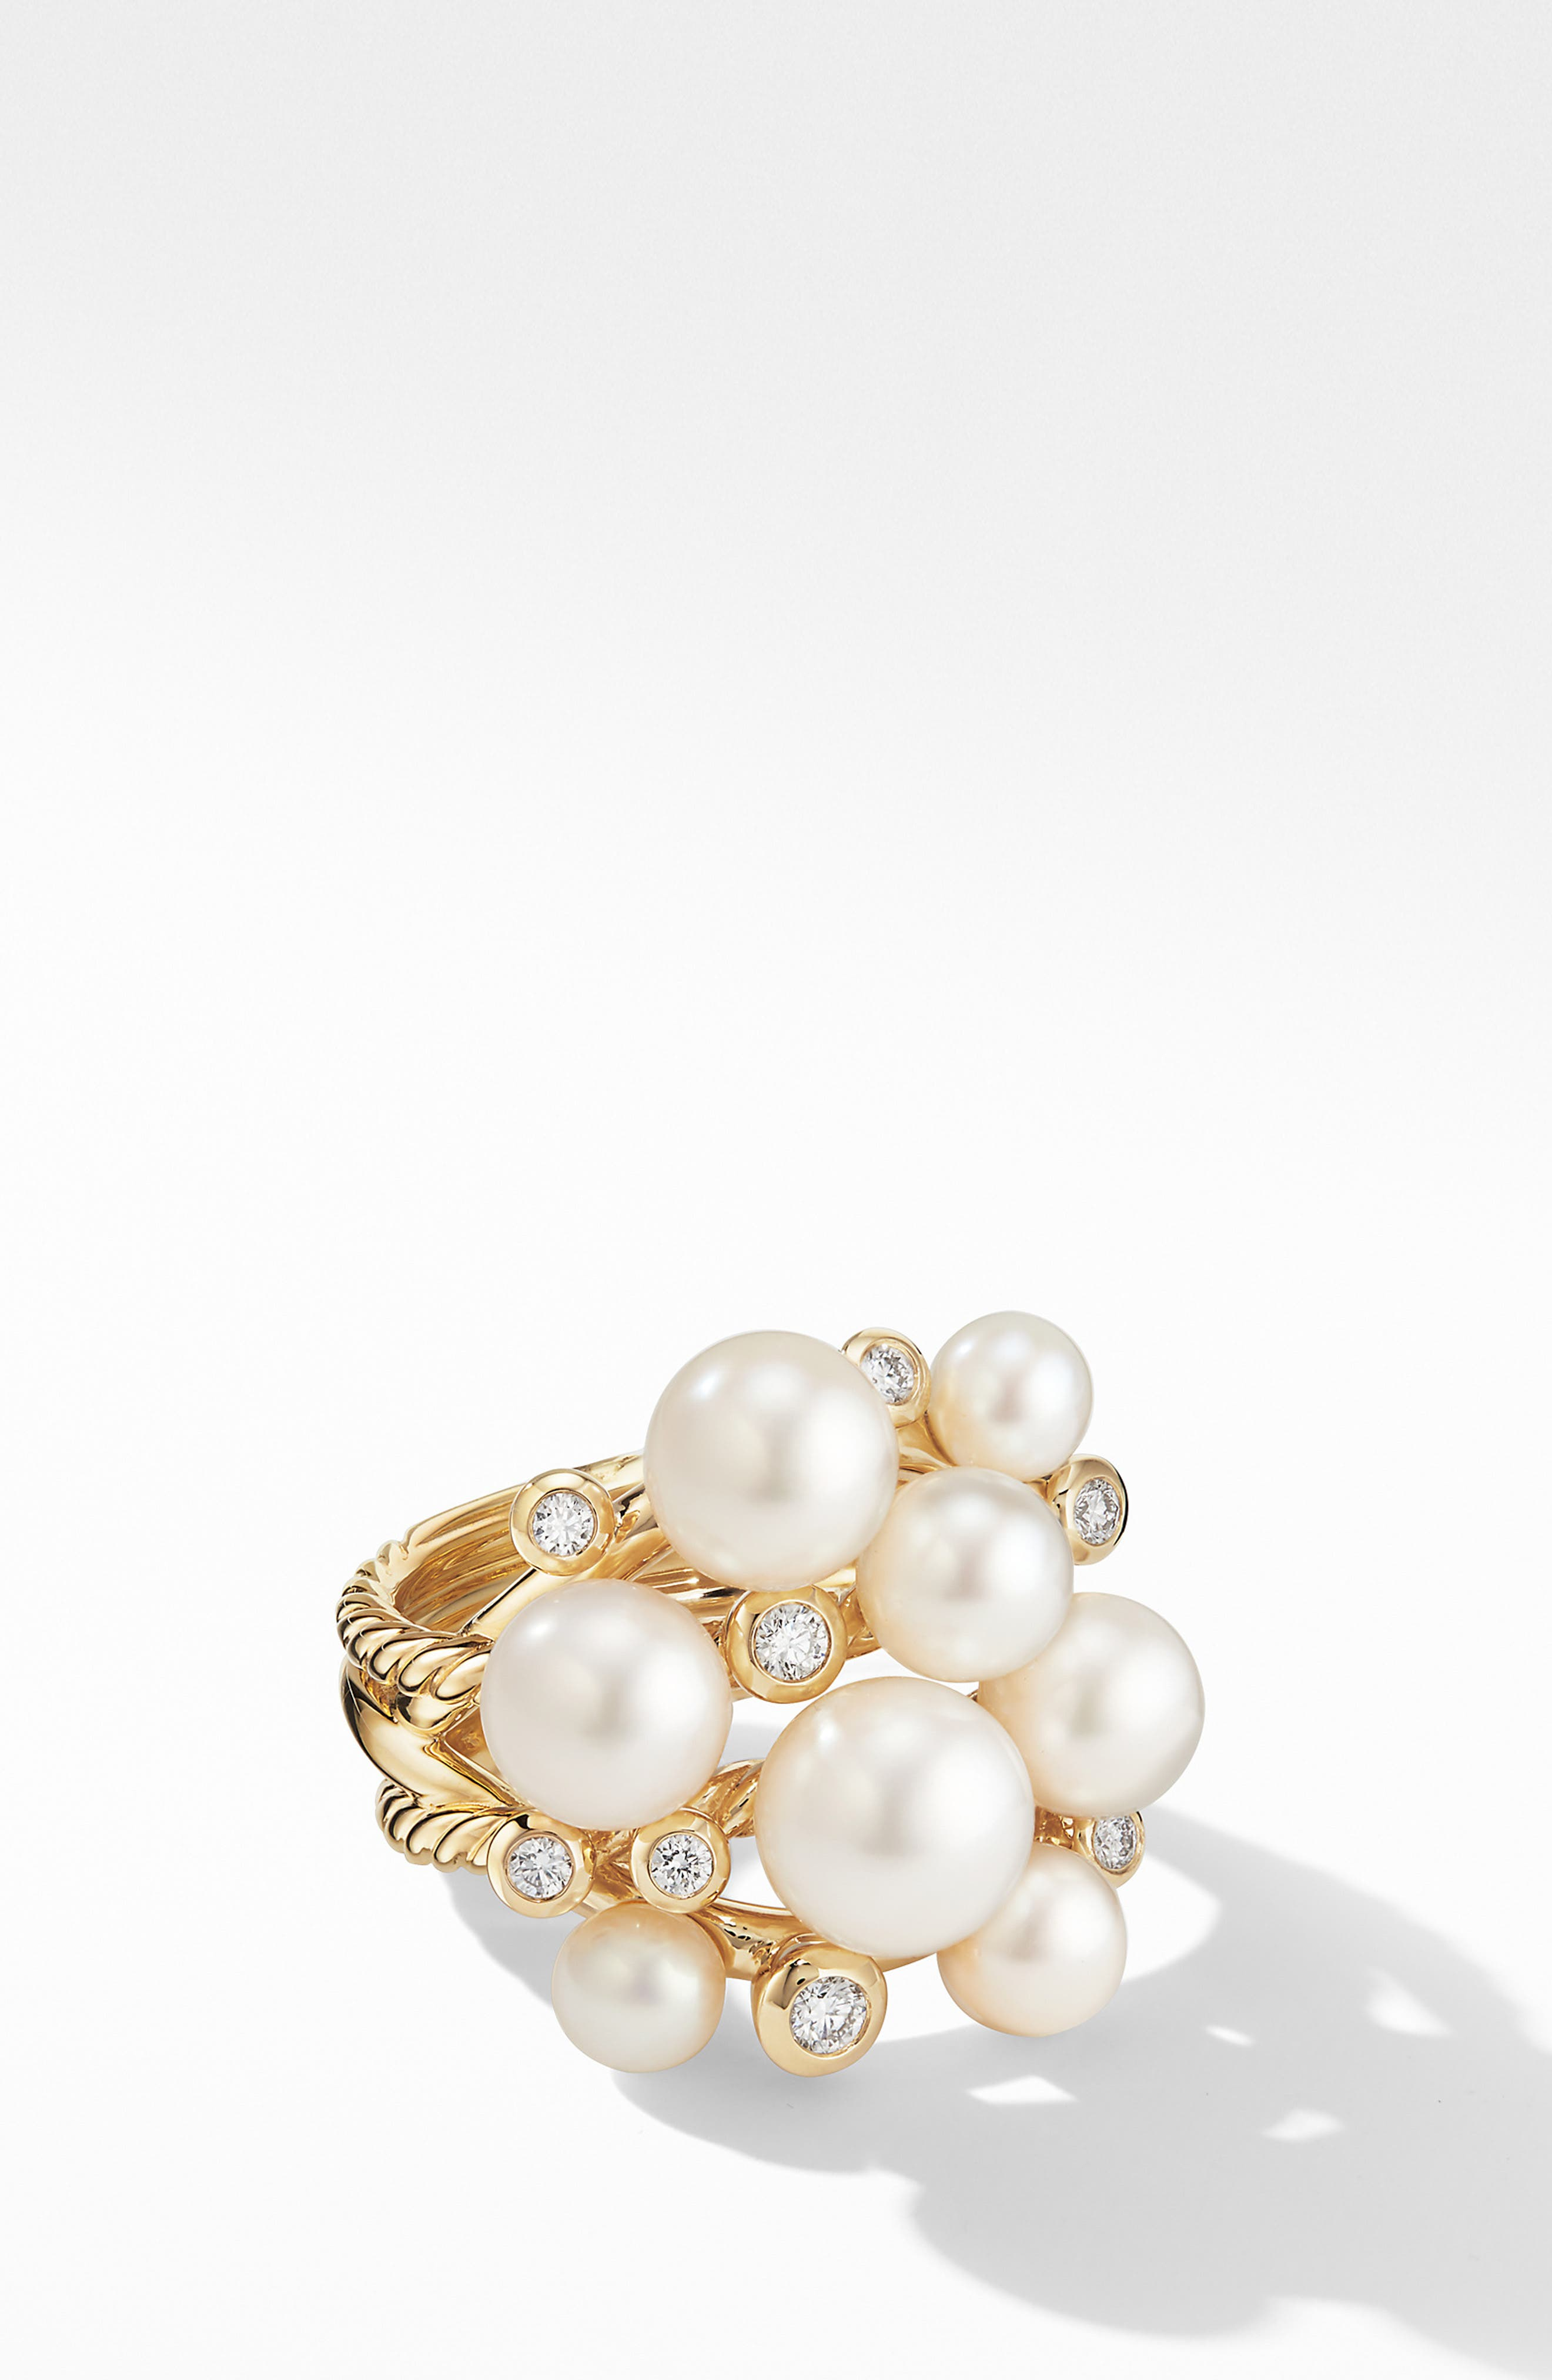 DAVID YURMAN, Large Pearl Cluster Ring with Diamonds, Main thumbnail 1, color, YELLOW GOLD/ DIAMOND/ PEARL